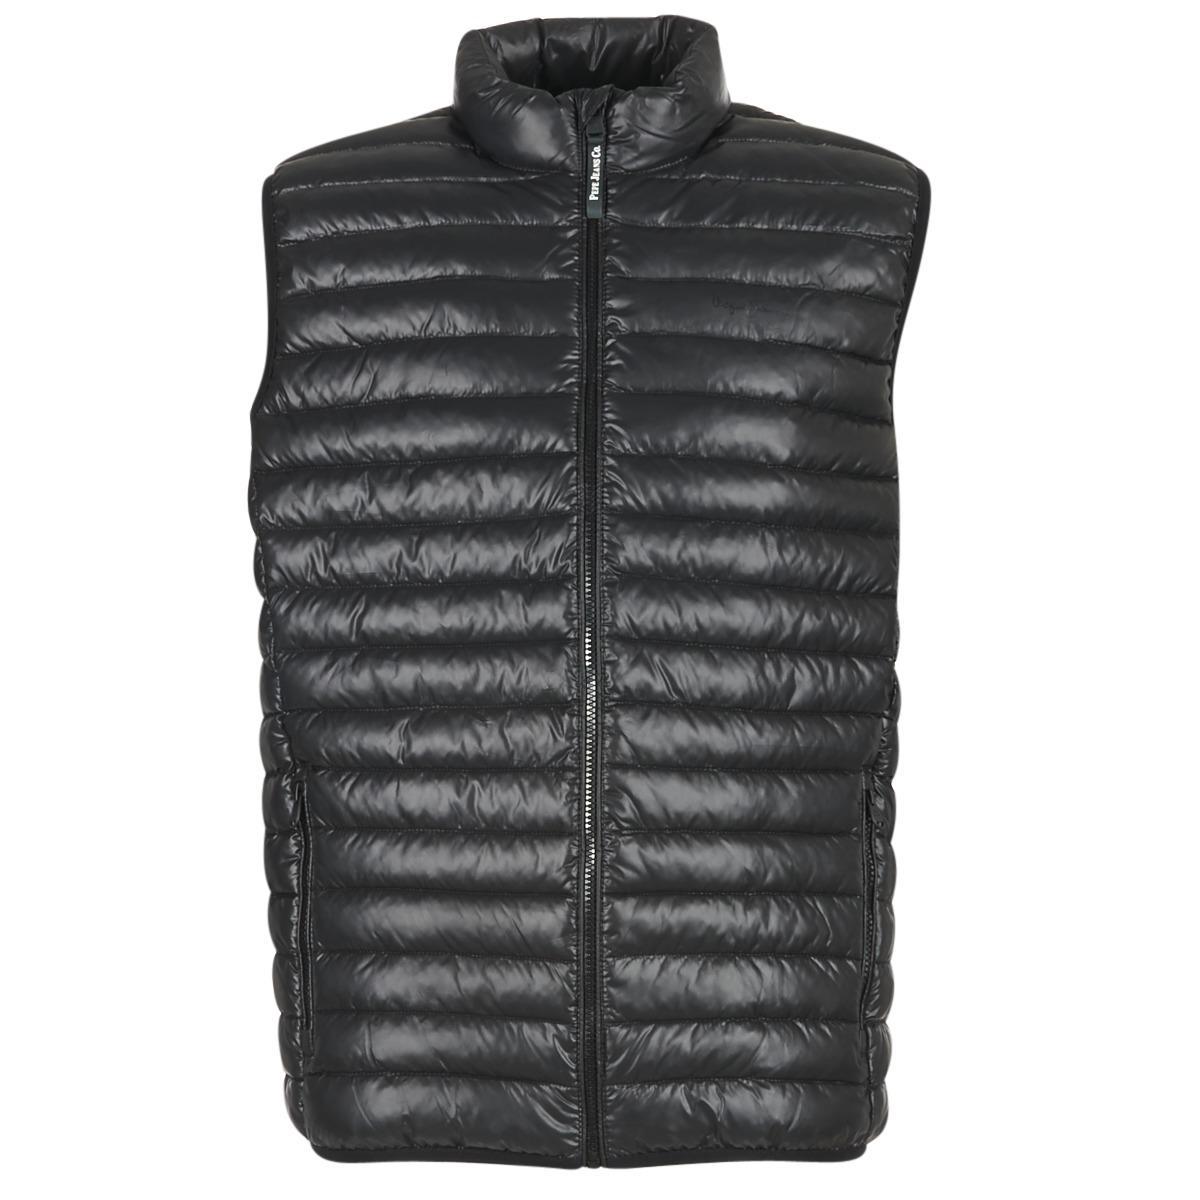 Pepe Jeans Denim Jugo Jacket in Black for Men